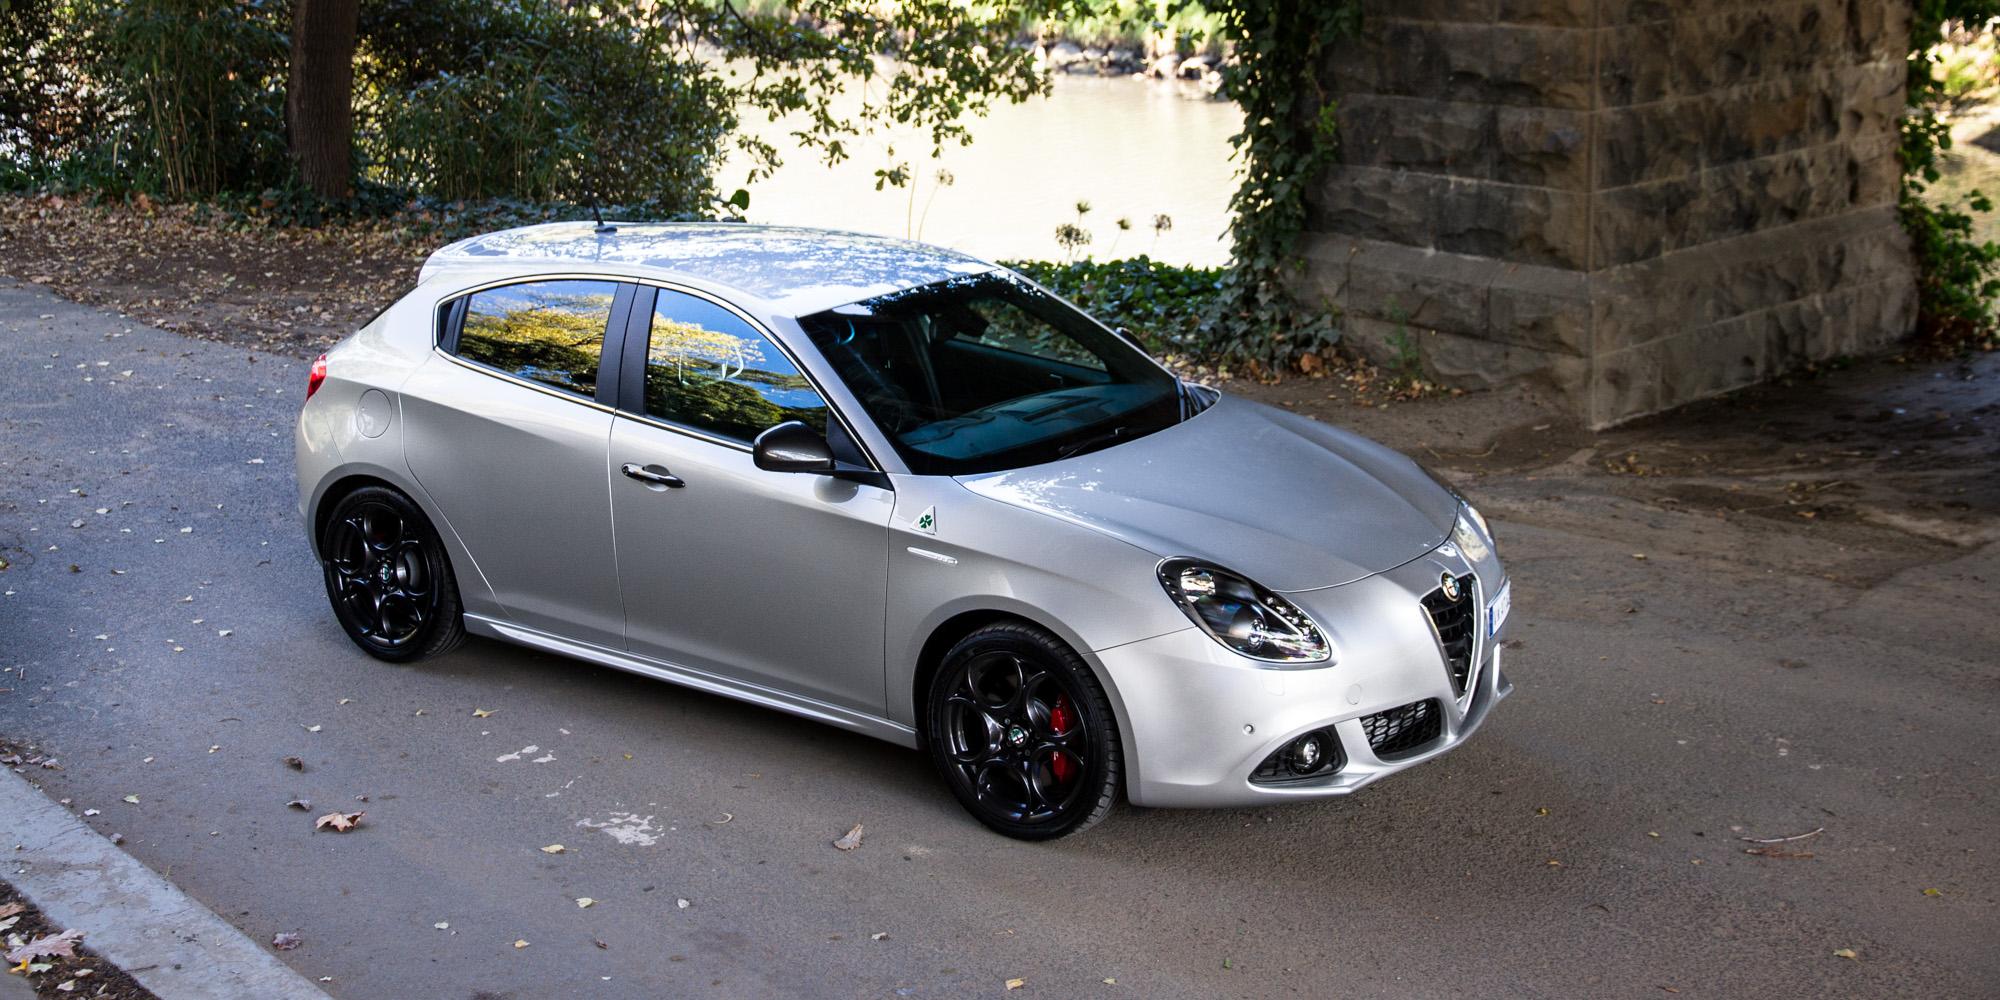 2015 Alfa Romeo Giulietta Qv Review Caradvice